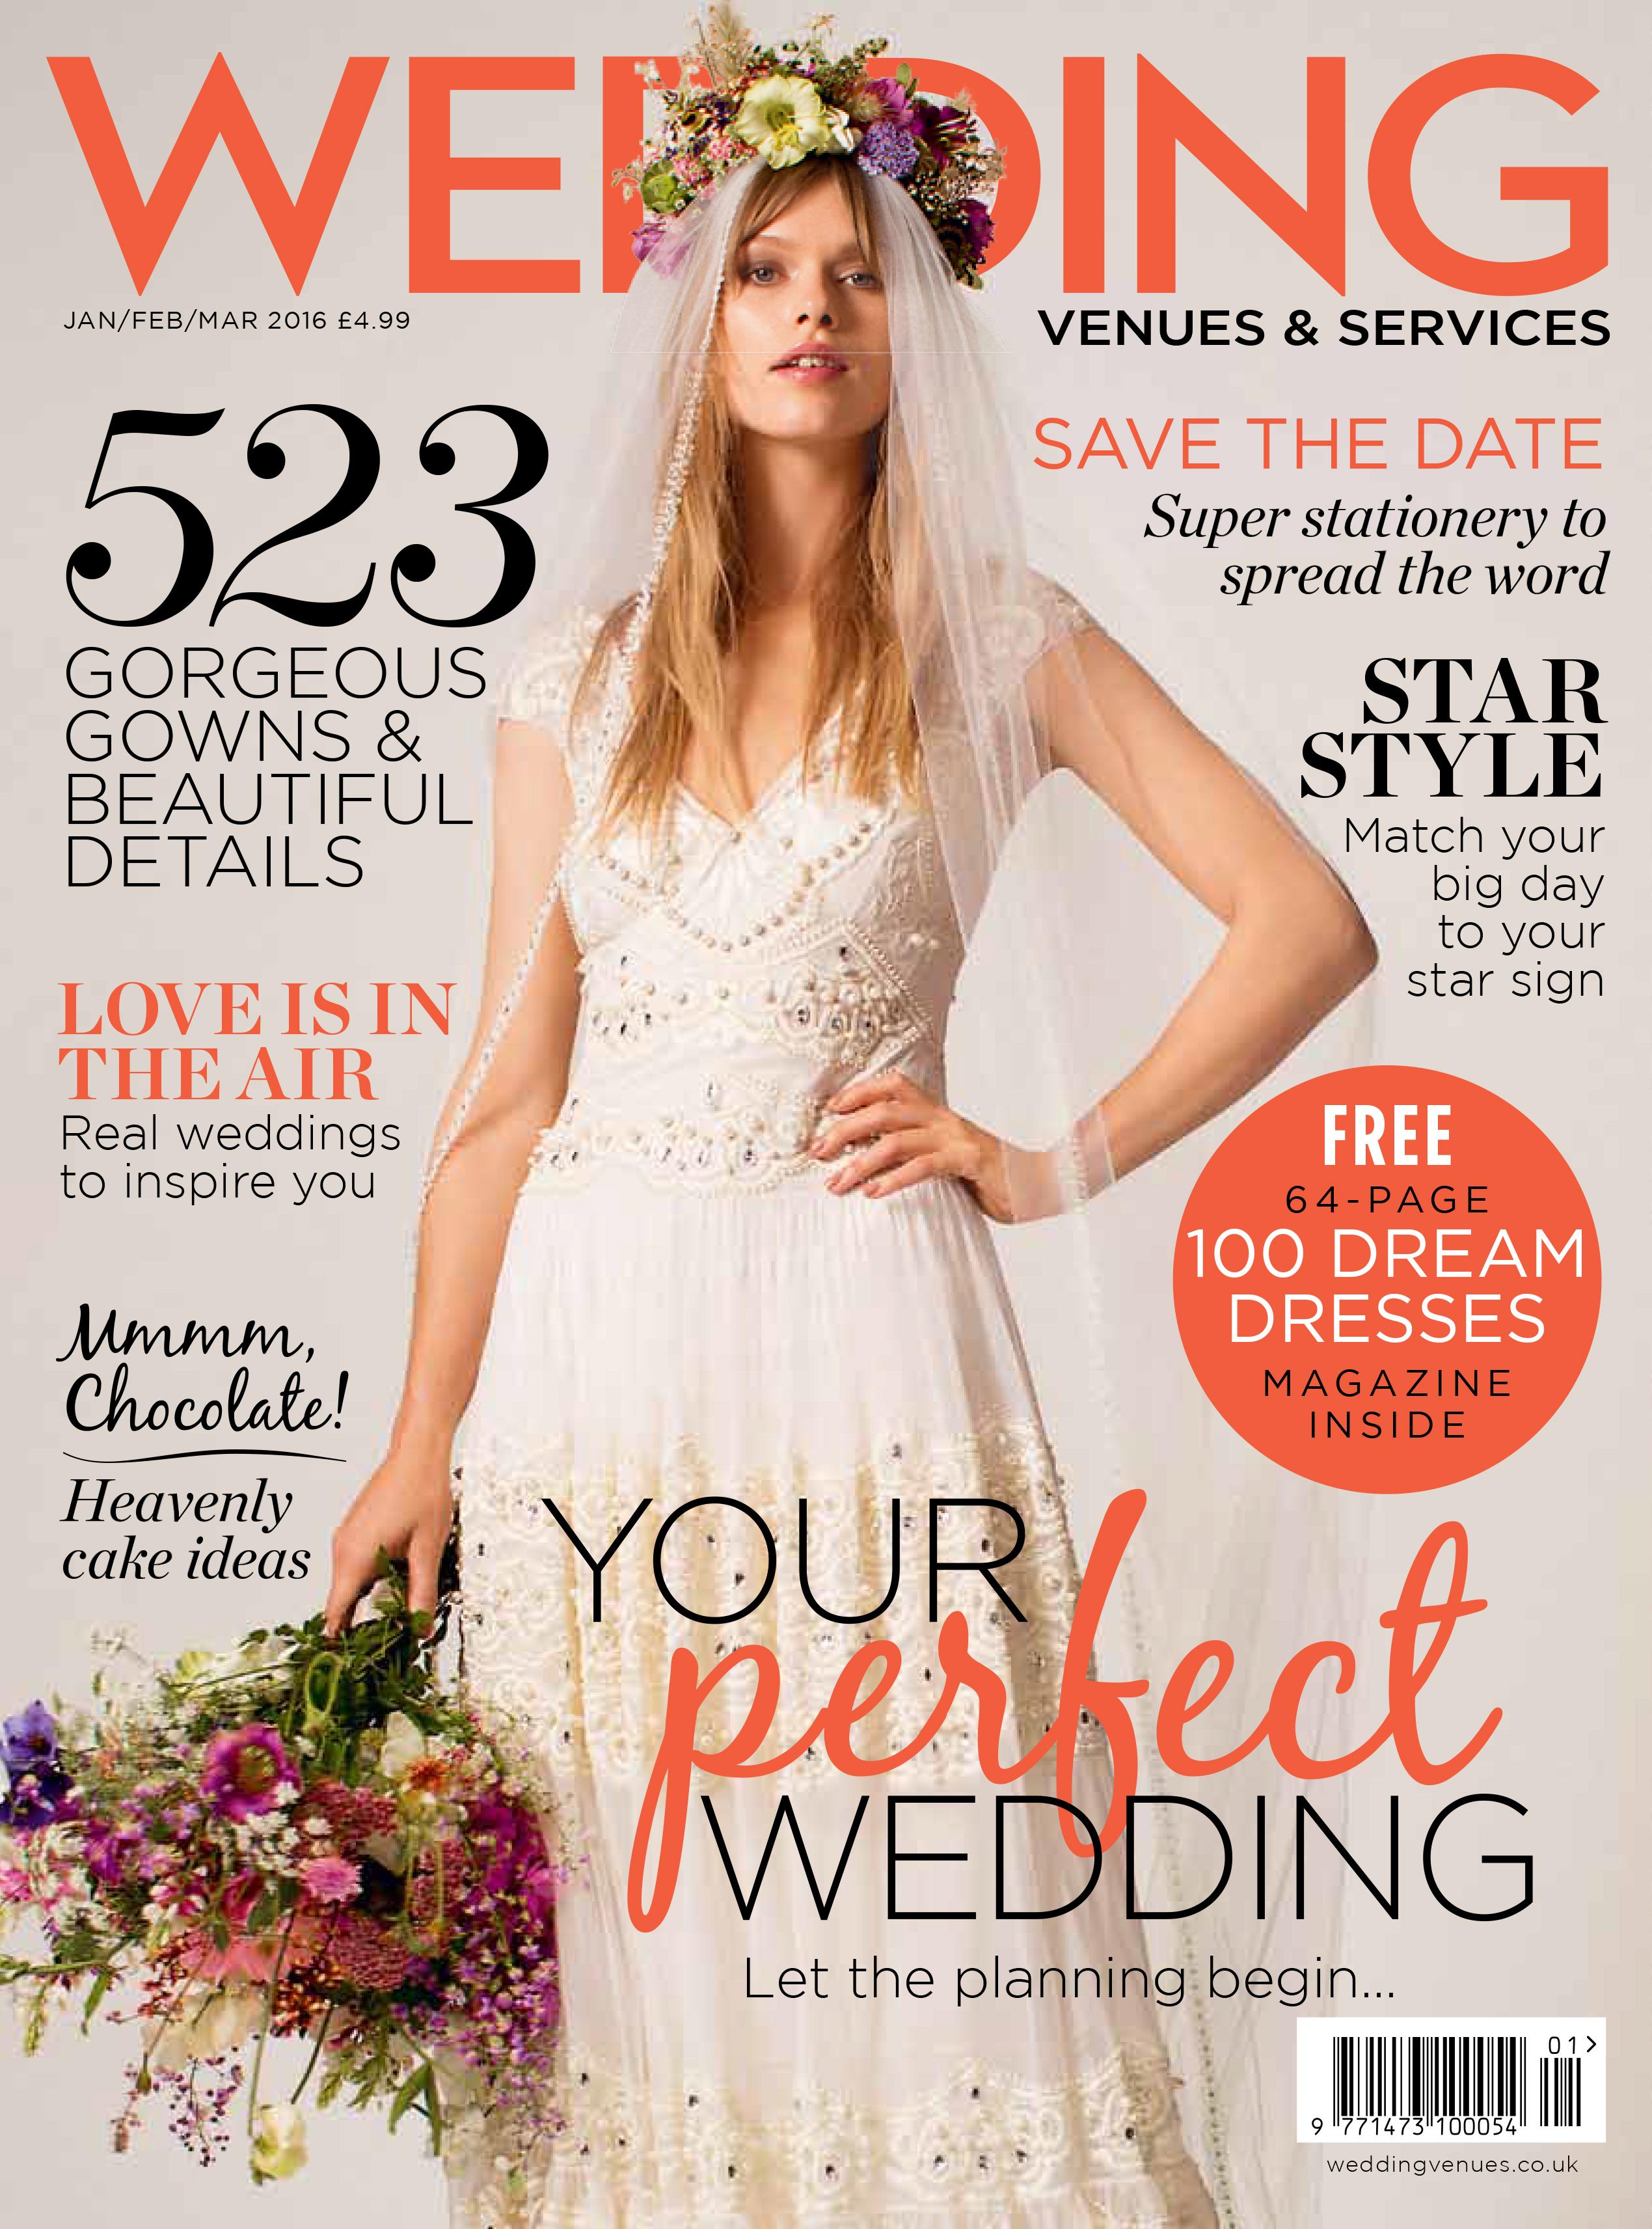 Wedding Venues cover designer wedding dresses by Caroline Castigliano